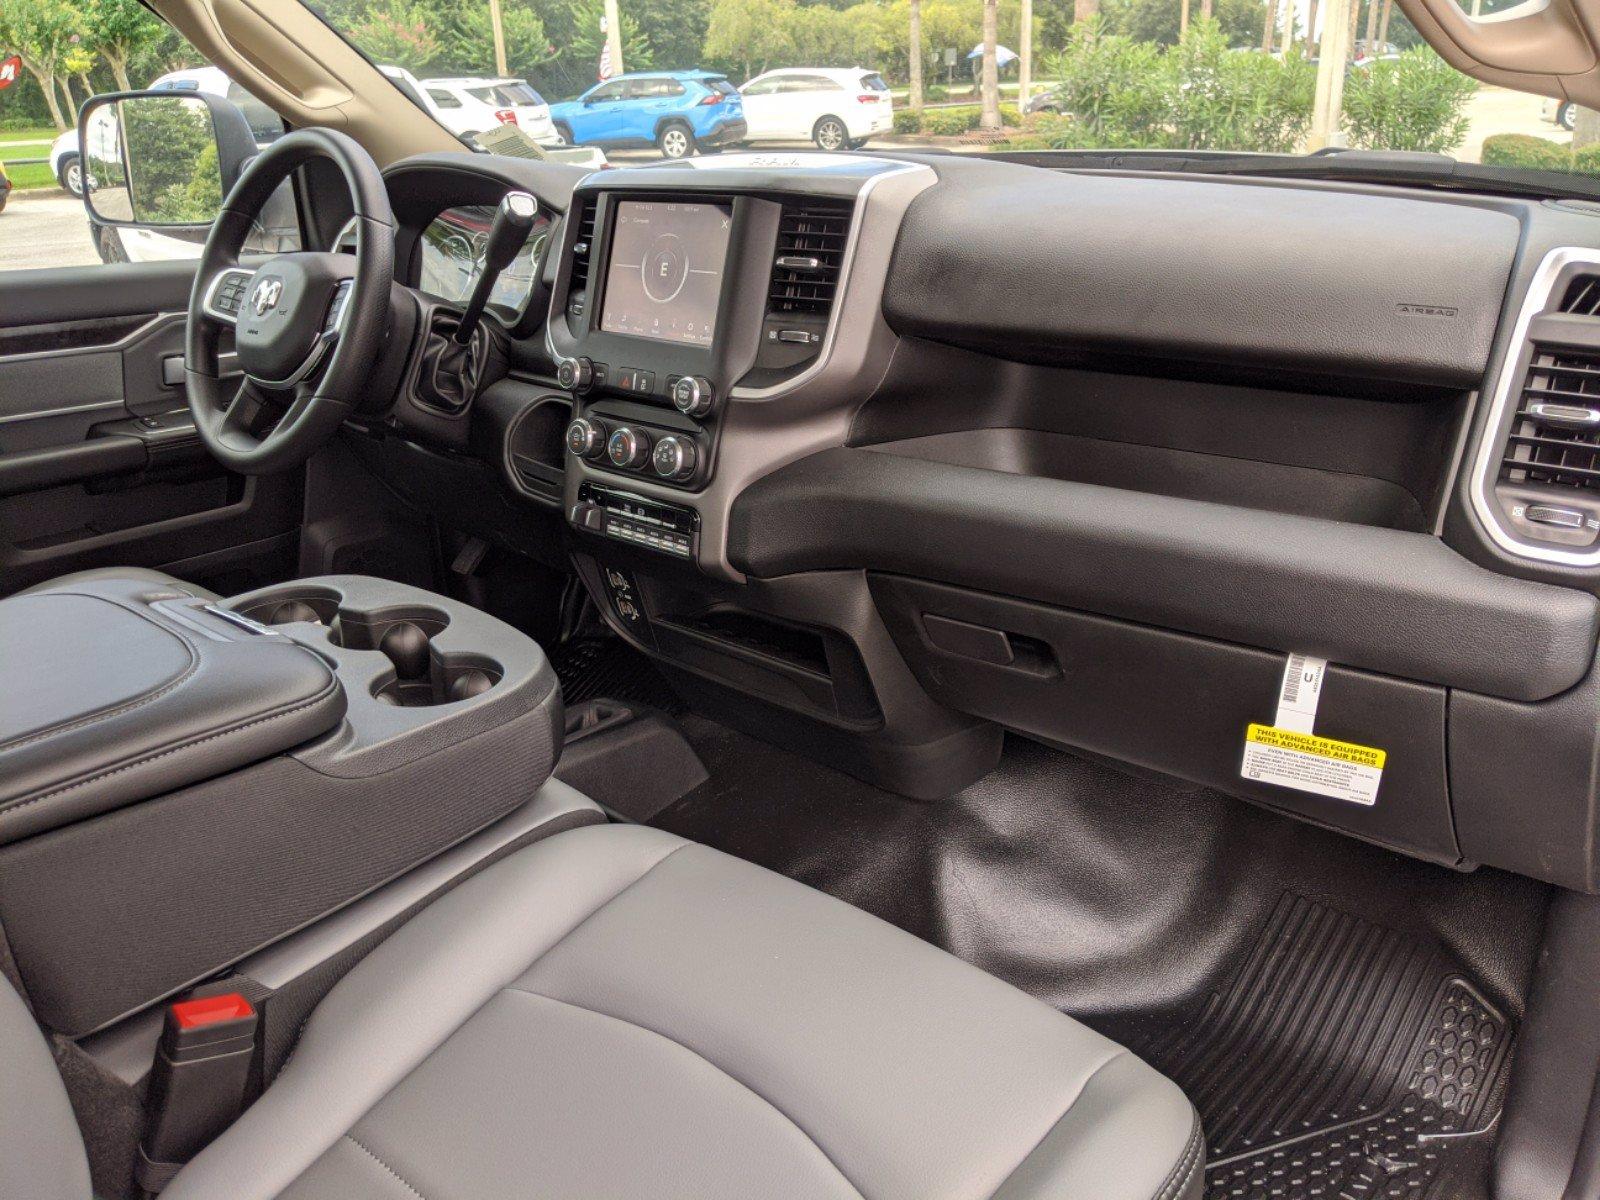 2020 Ram 4500 Regular Cab DRW 4x4, Cab Chassis #R20203 - photo 19